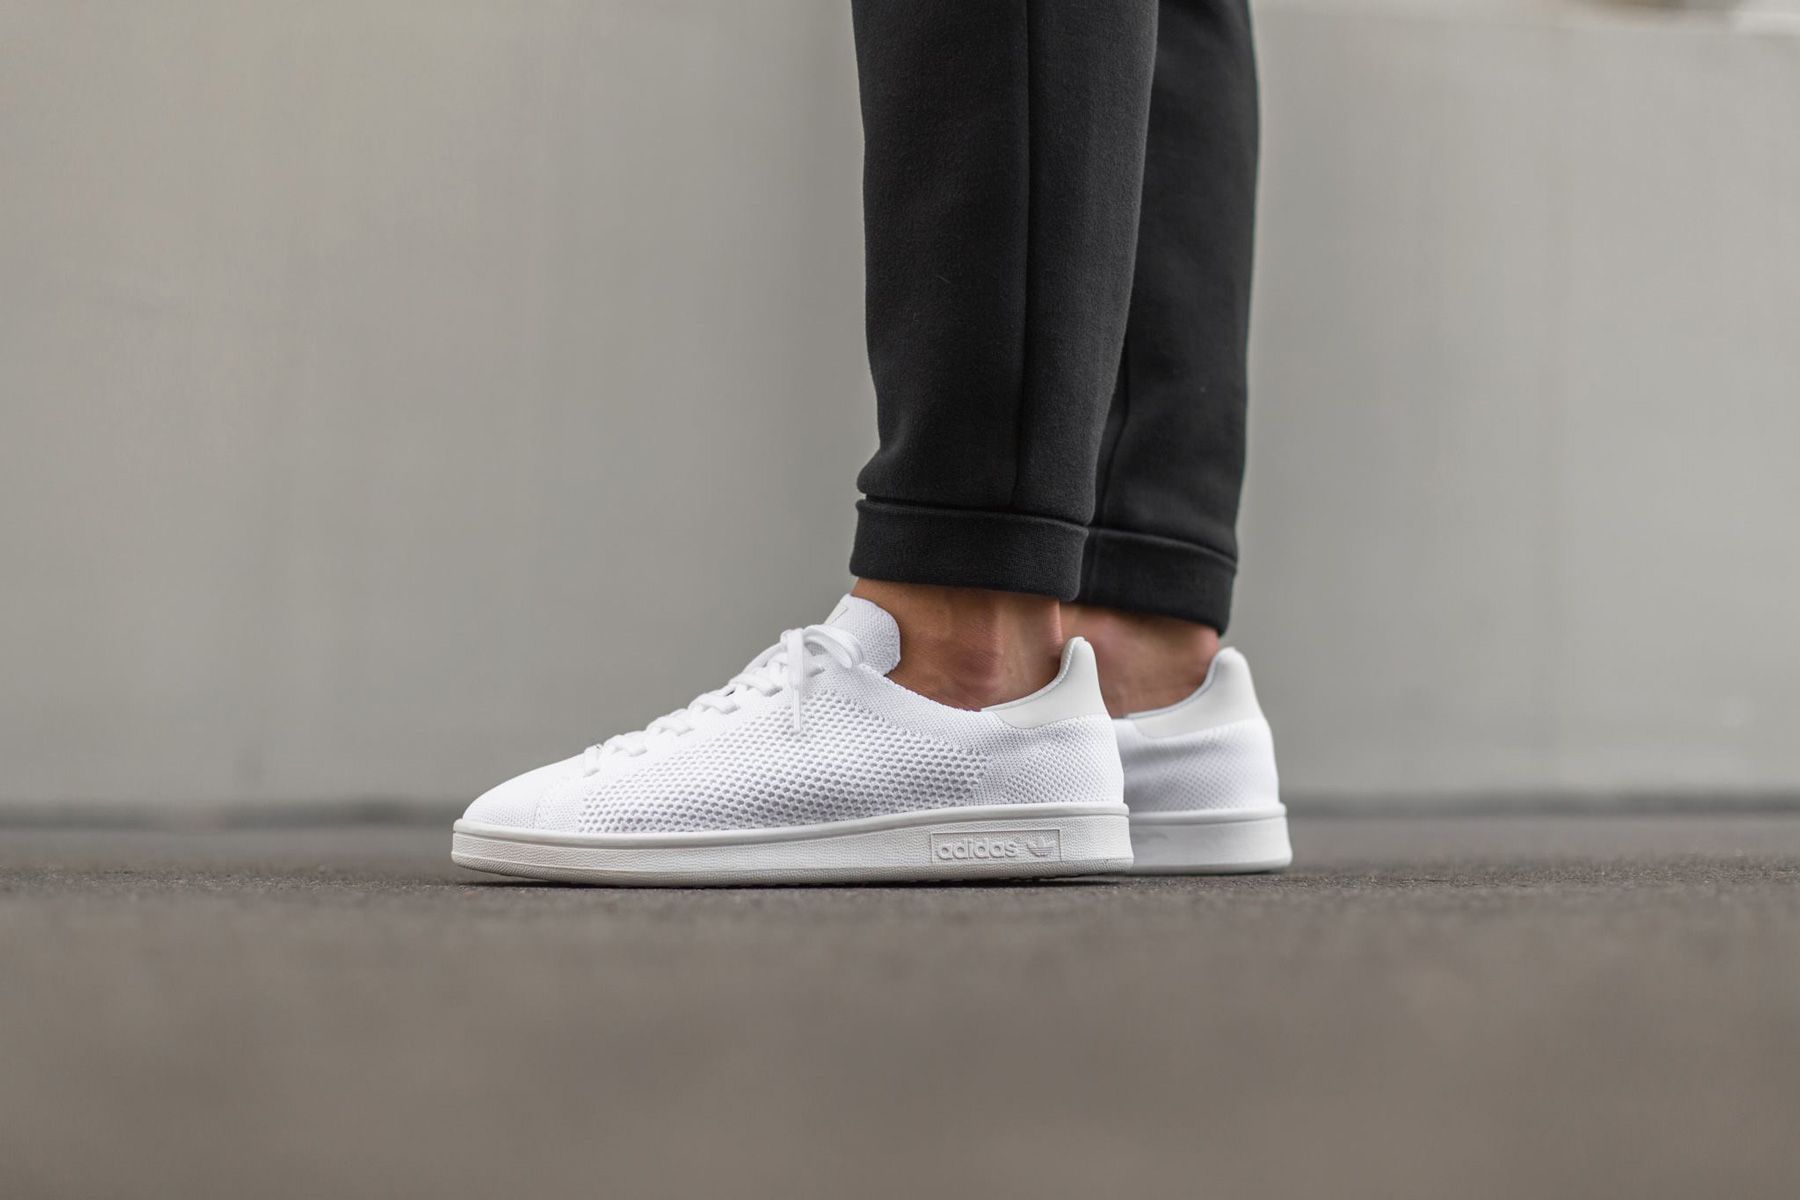 adidas originals triple white stan smith sneakers